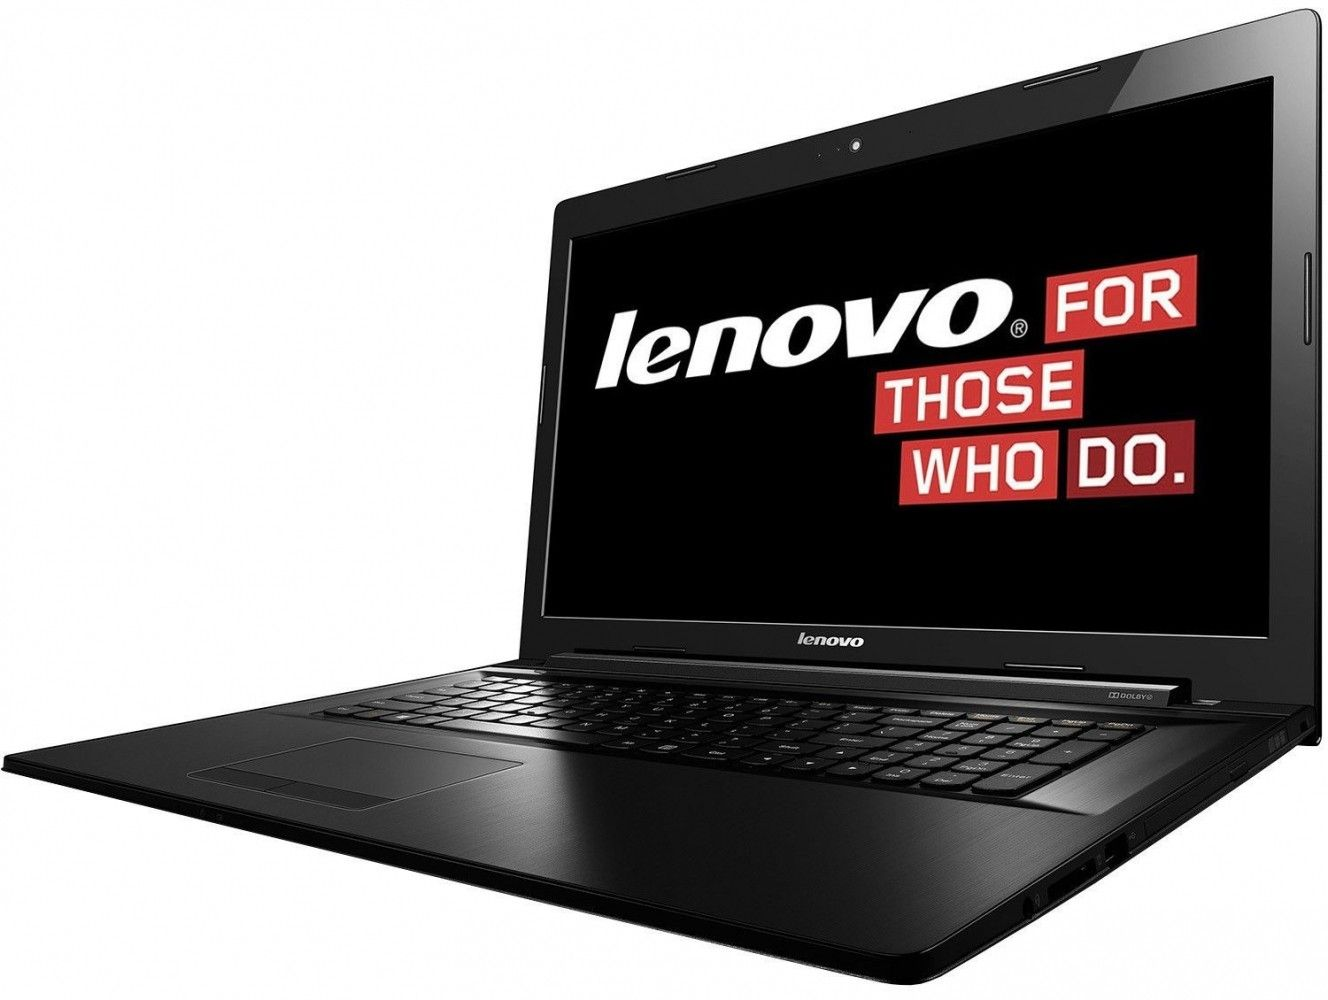 Ноутбук Lenovo IdeaPad Z70-80 (80FG00DYUA) Black - 3